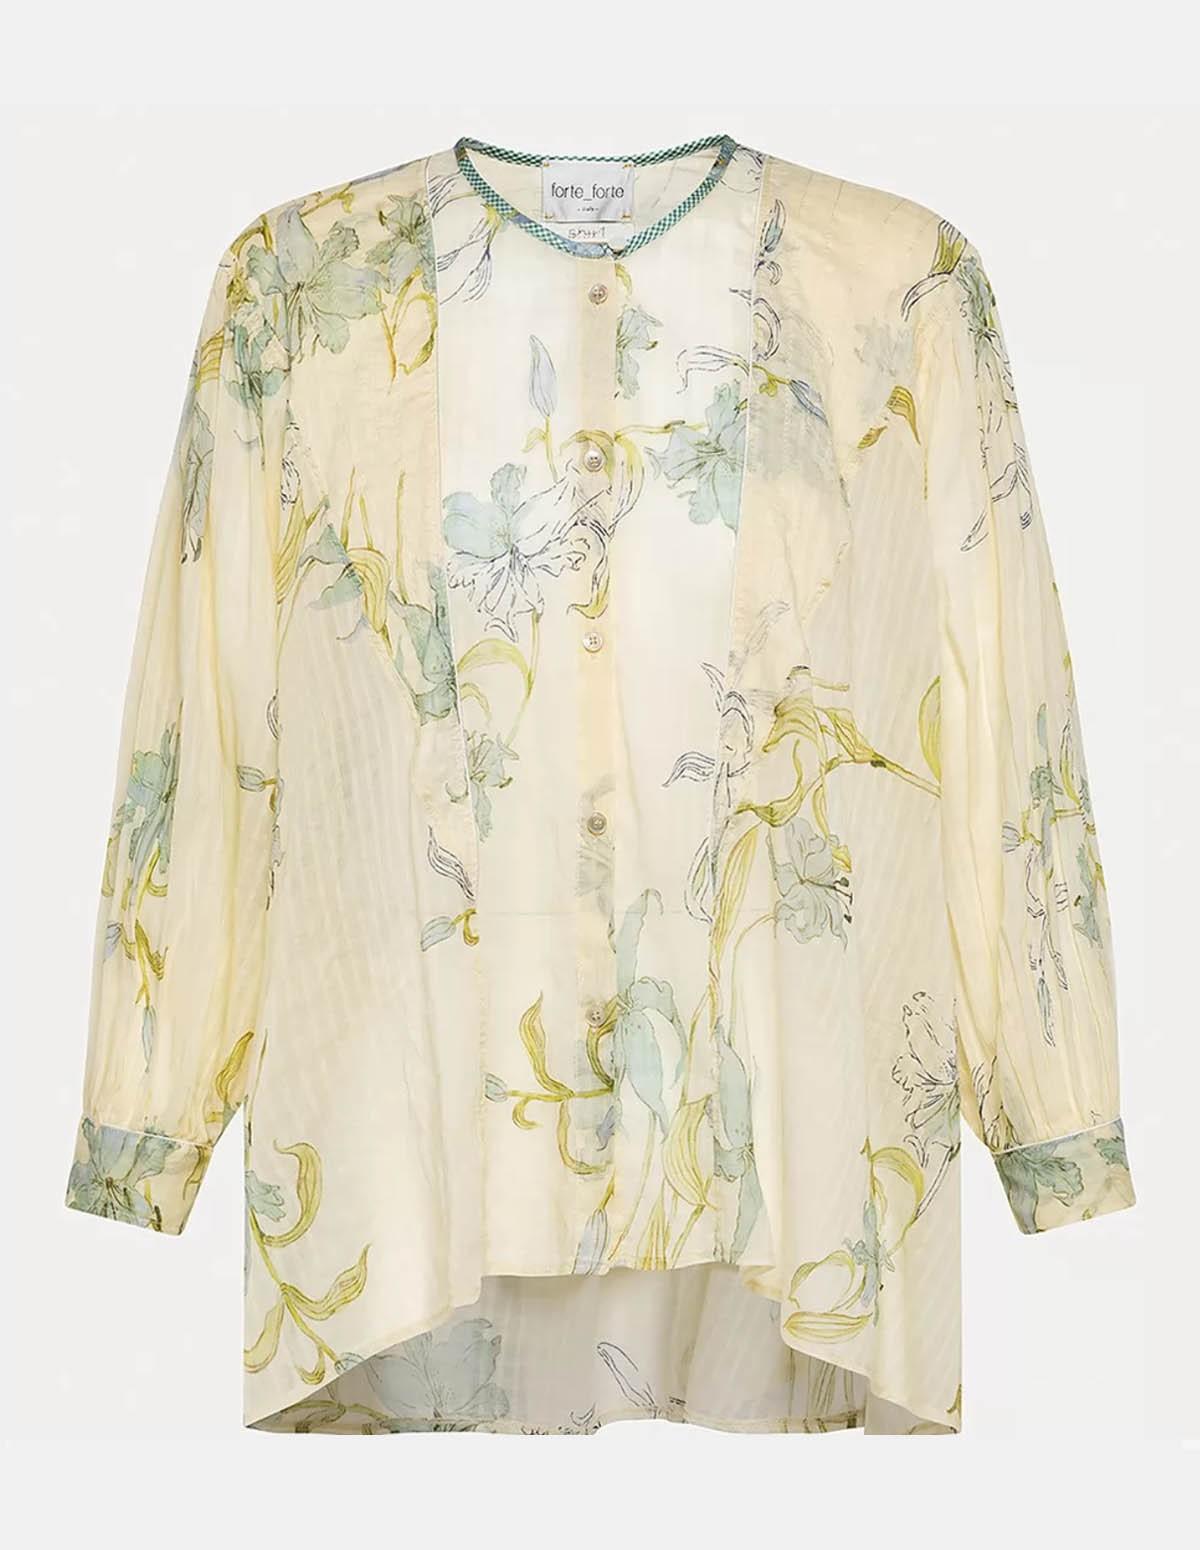 Forte 8094 Shirt - IVORY